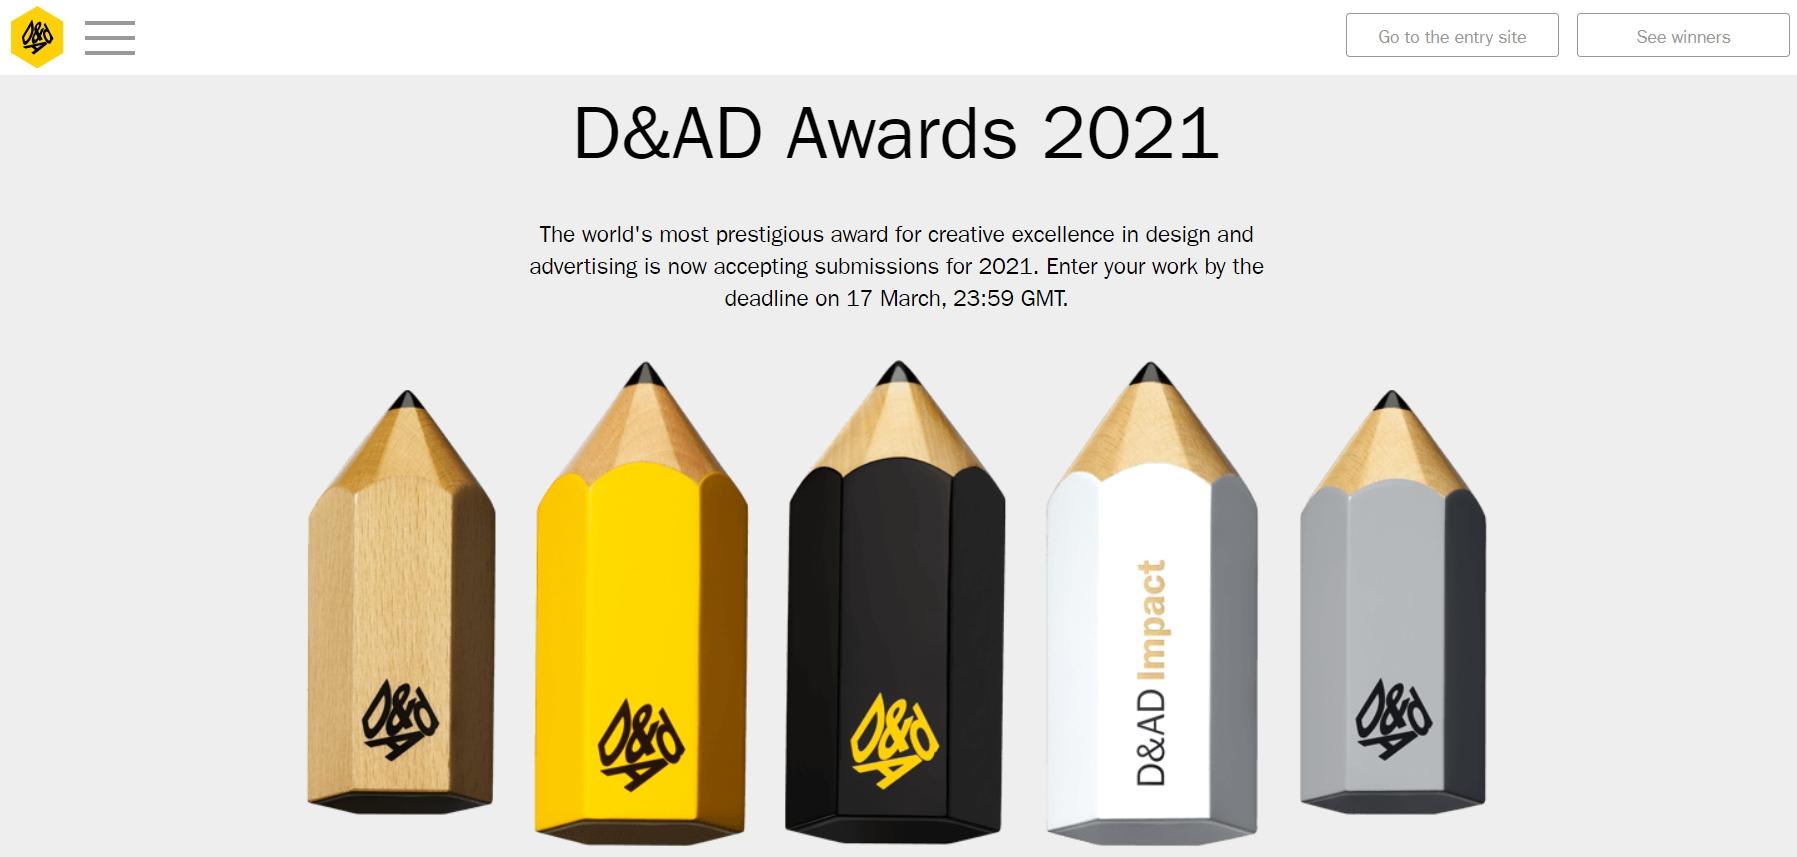 D&AD Awards 2021